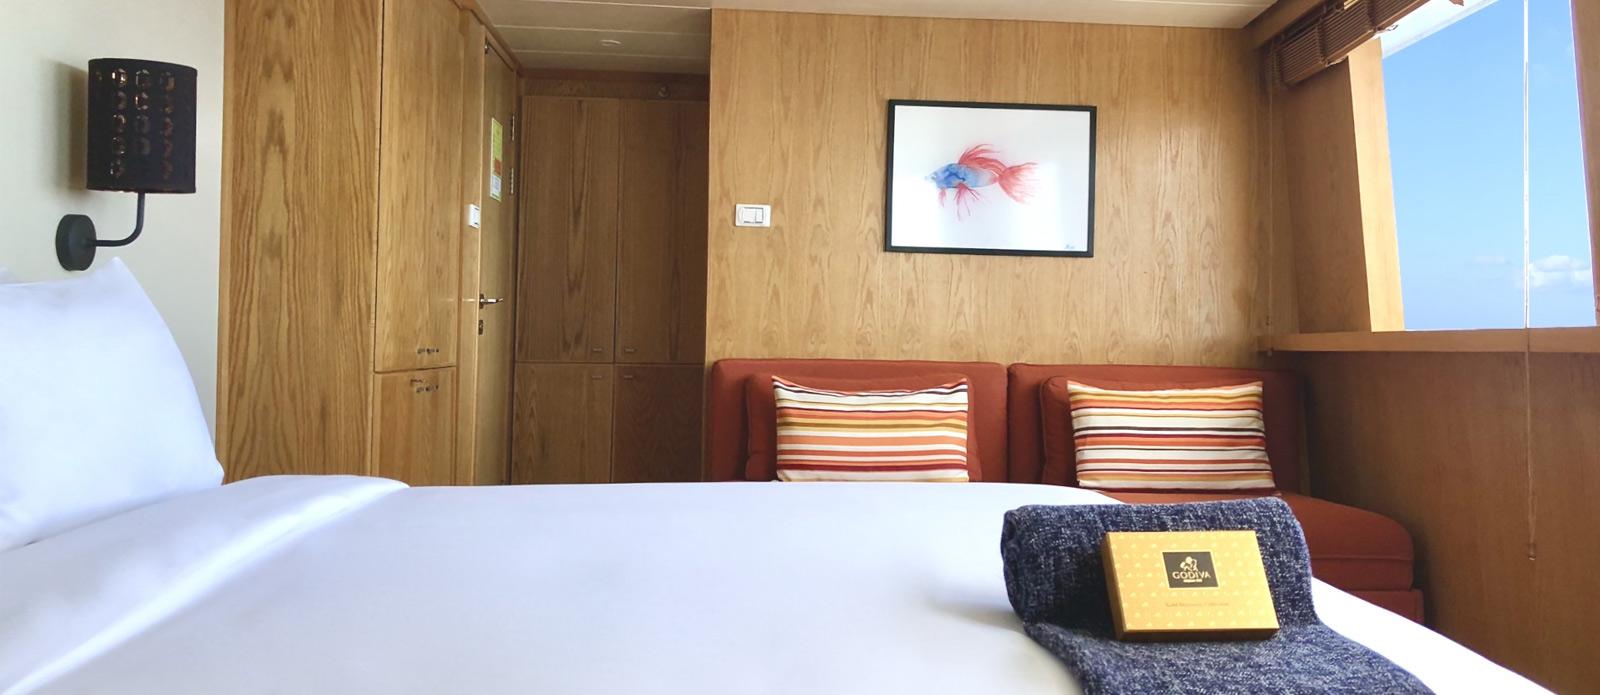 Safira-Luxury-Yacht-For-Sale-Interior-7